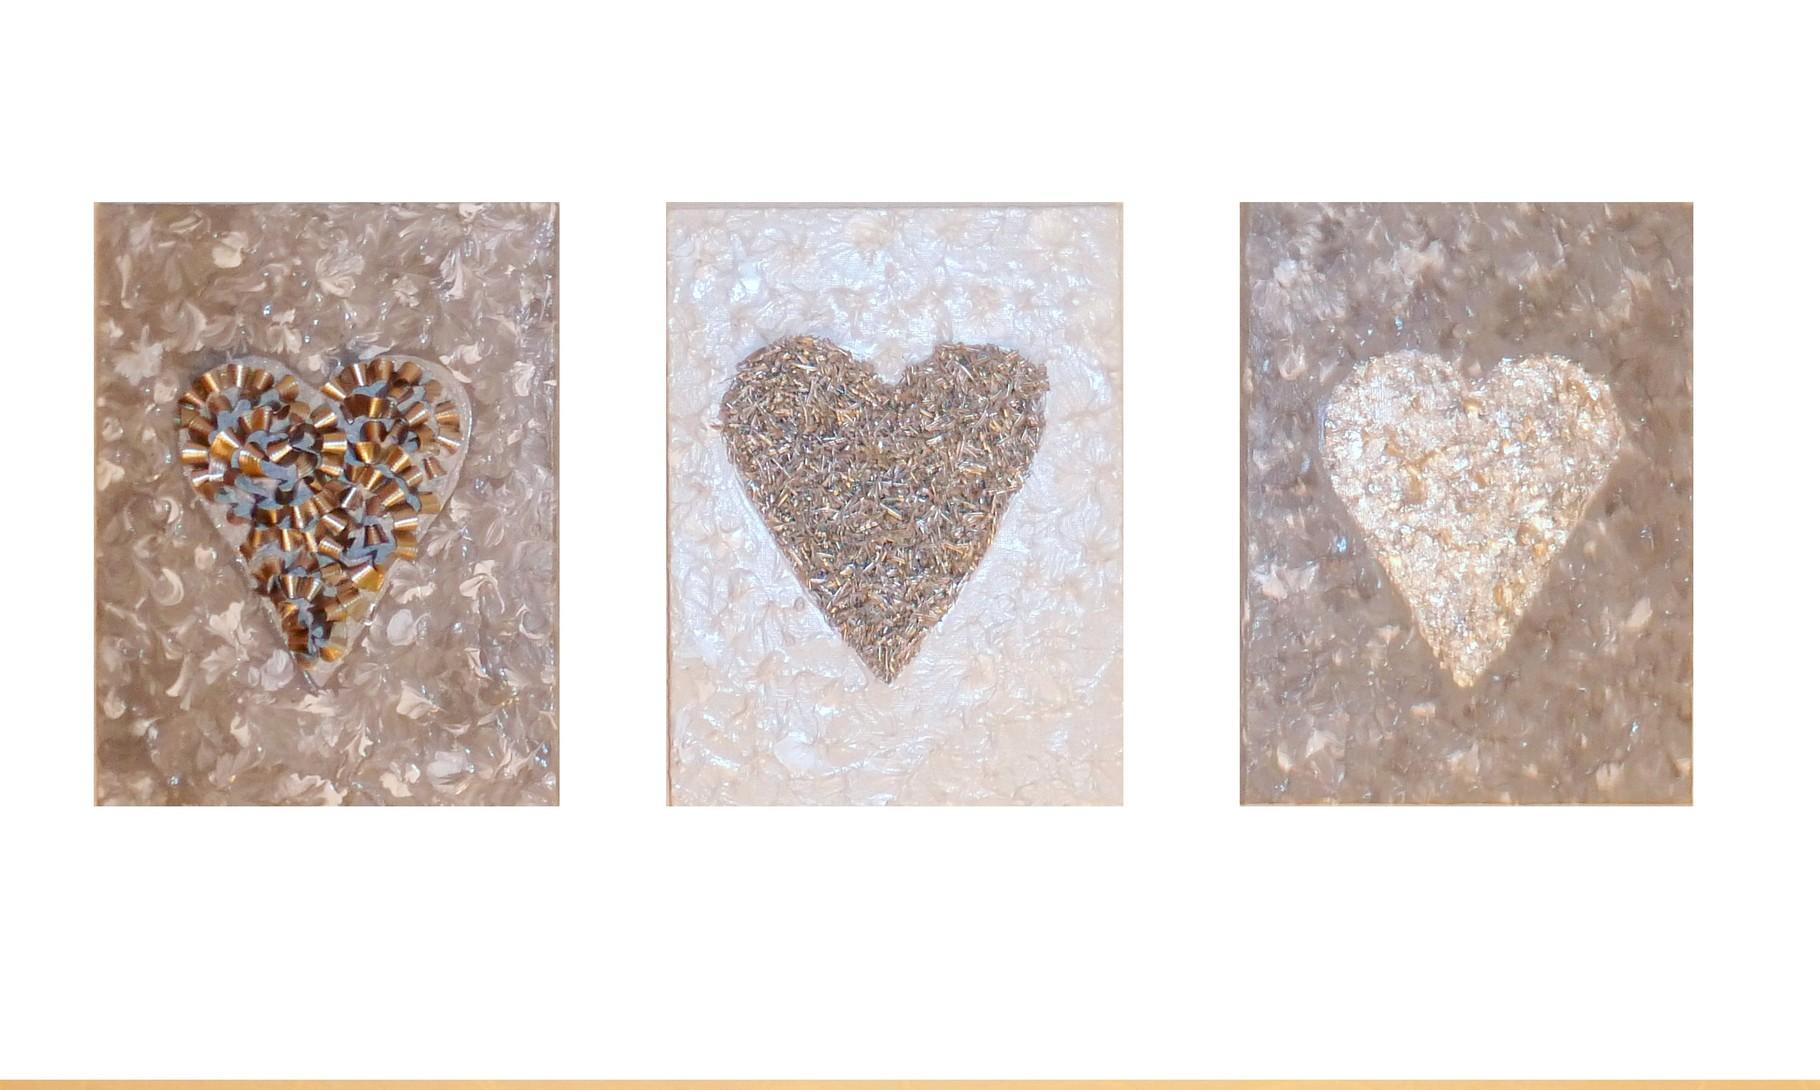 Silver Hearts (Triptychon, Assemblage auf Leinwand 20x30cm, 20x30cm, 20x30cm)